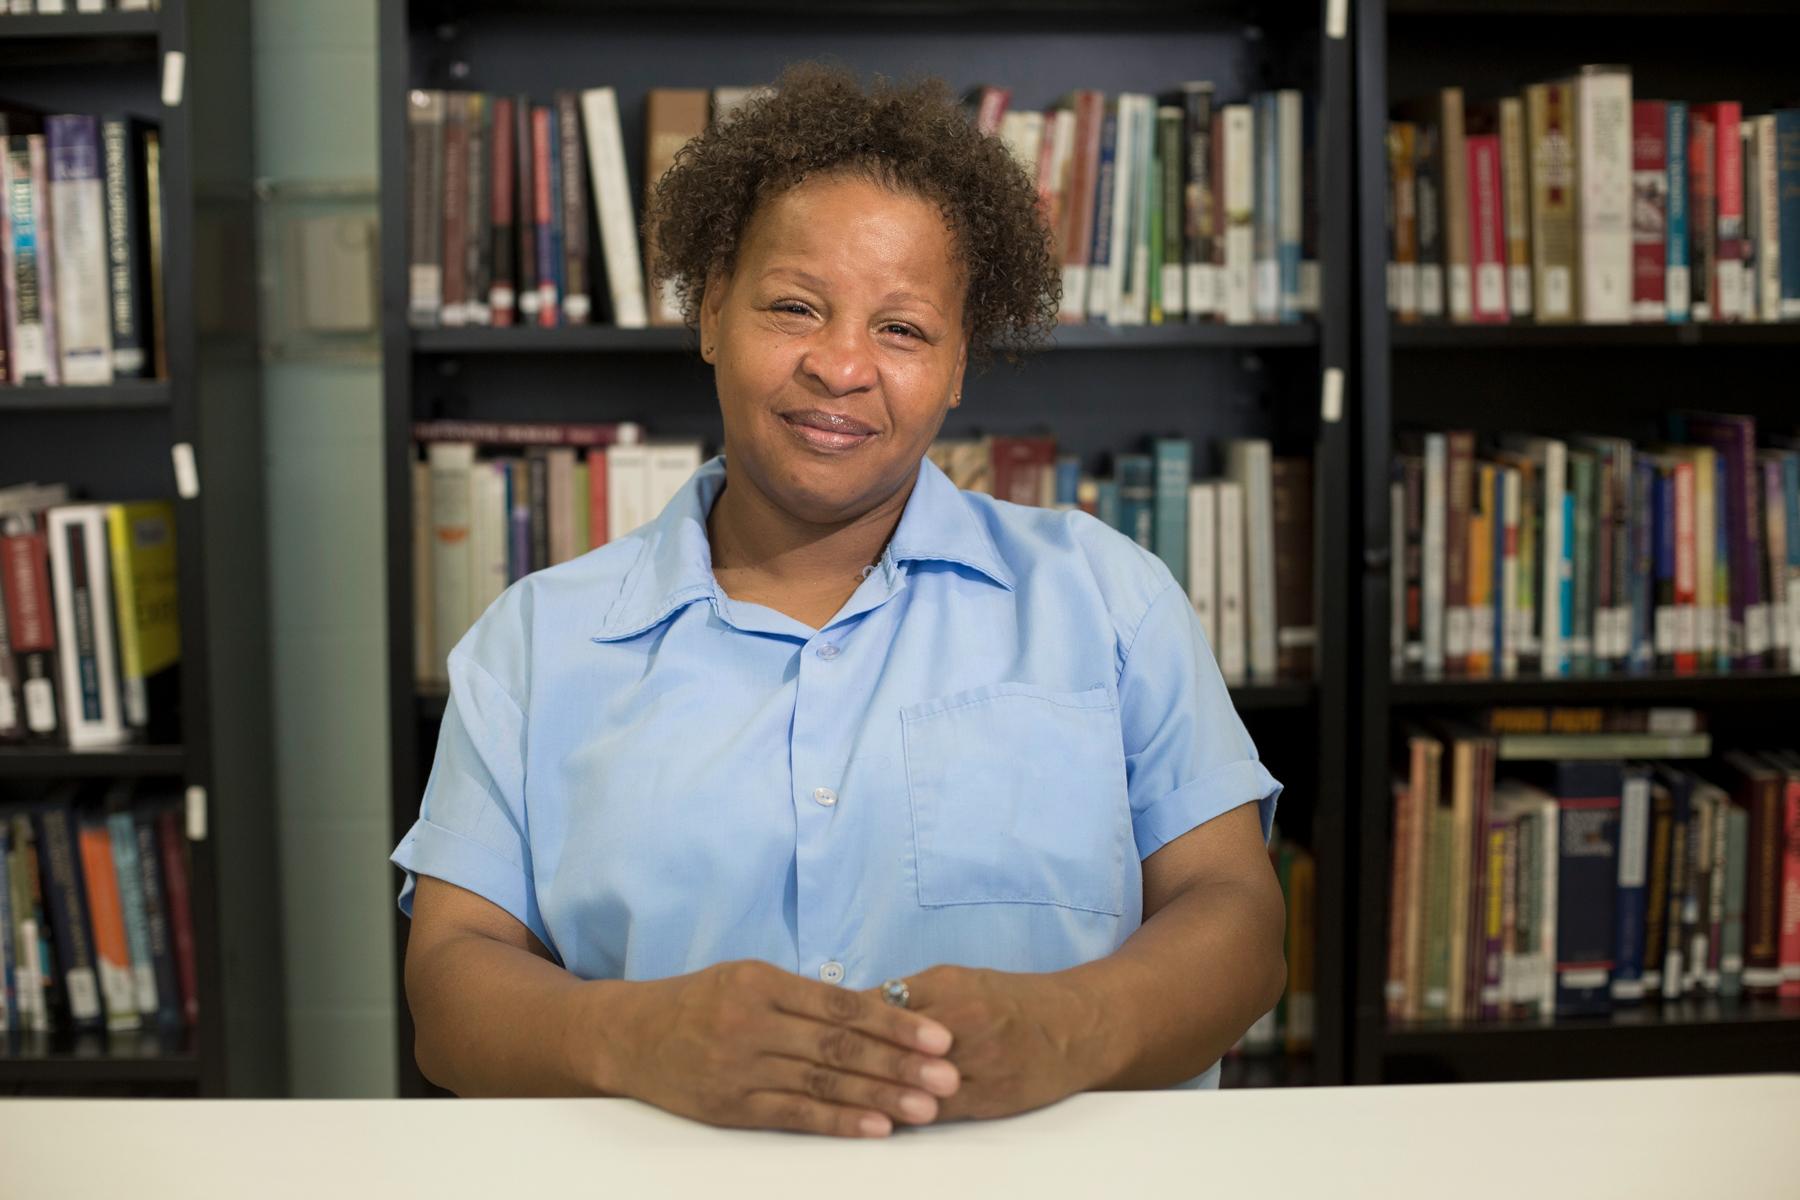 Life in Louisiana: People aging in prison seek a second